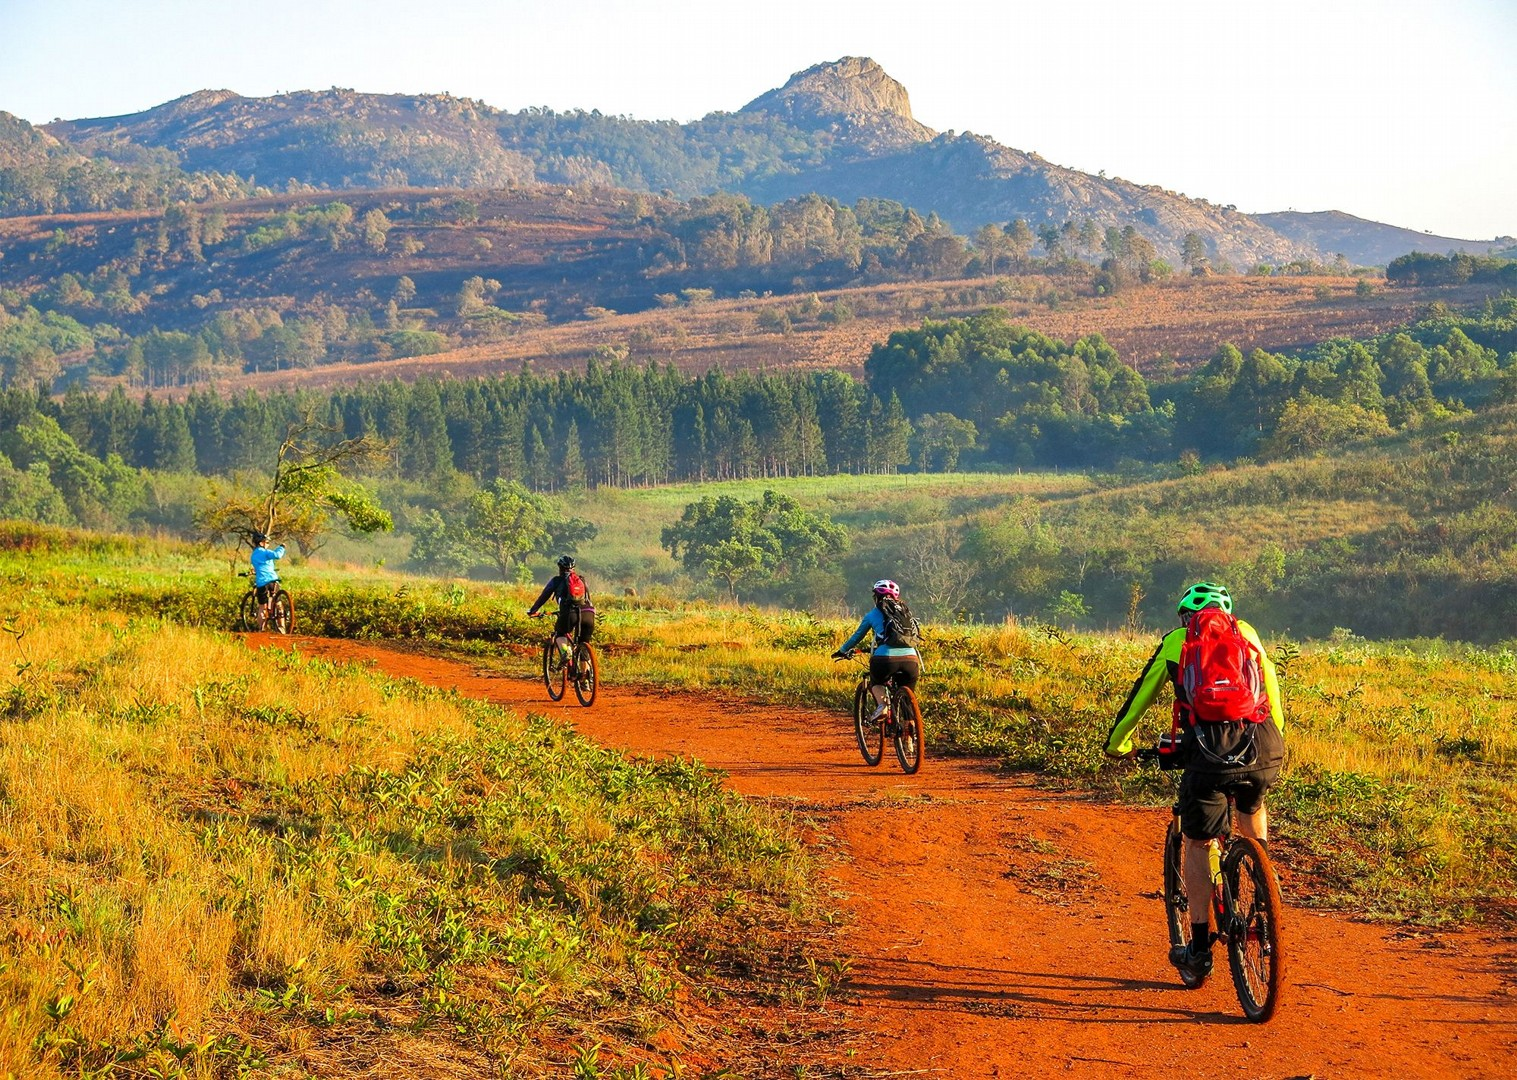 rgfdgfg16.jpg - Eswatini (Swaziland) - Cycling Safari - Cycling Adventures